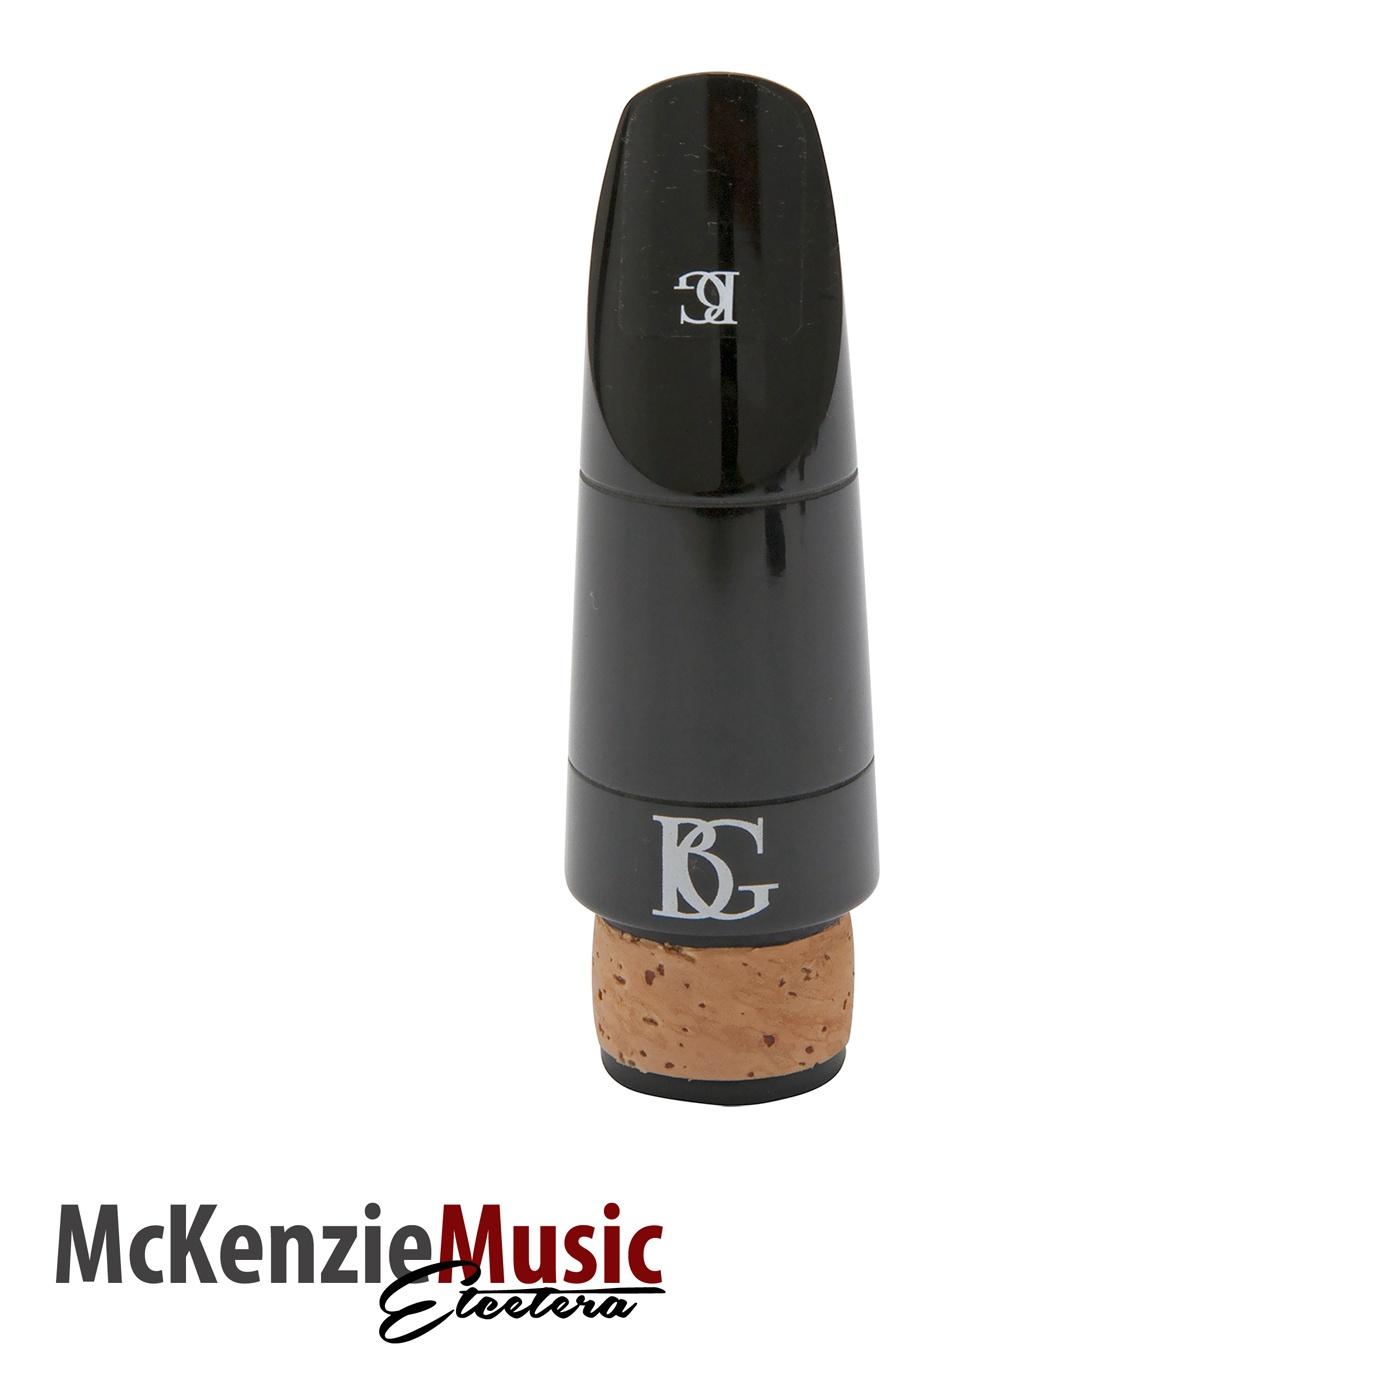 BG Clarinet Mouthpiece Zinner B1